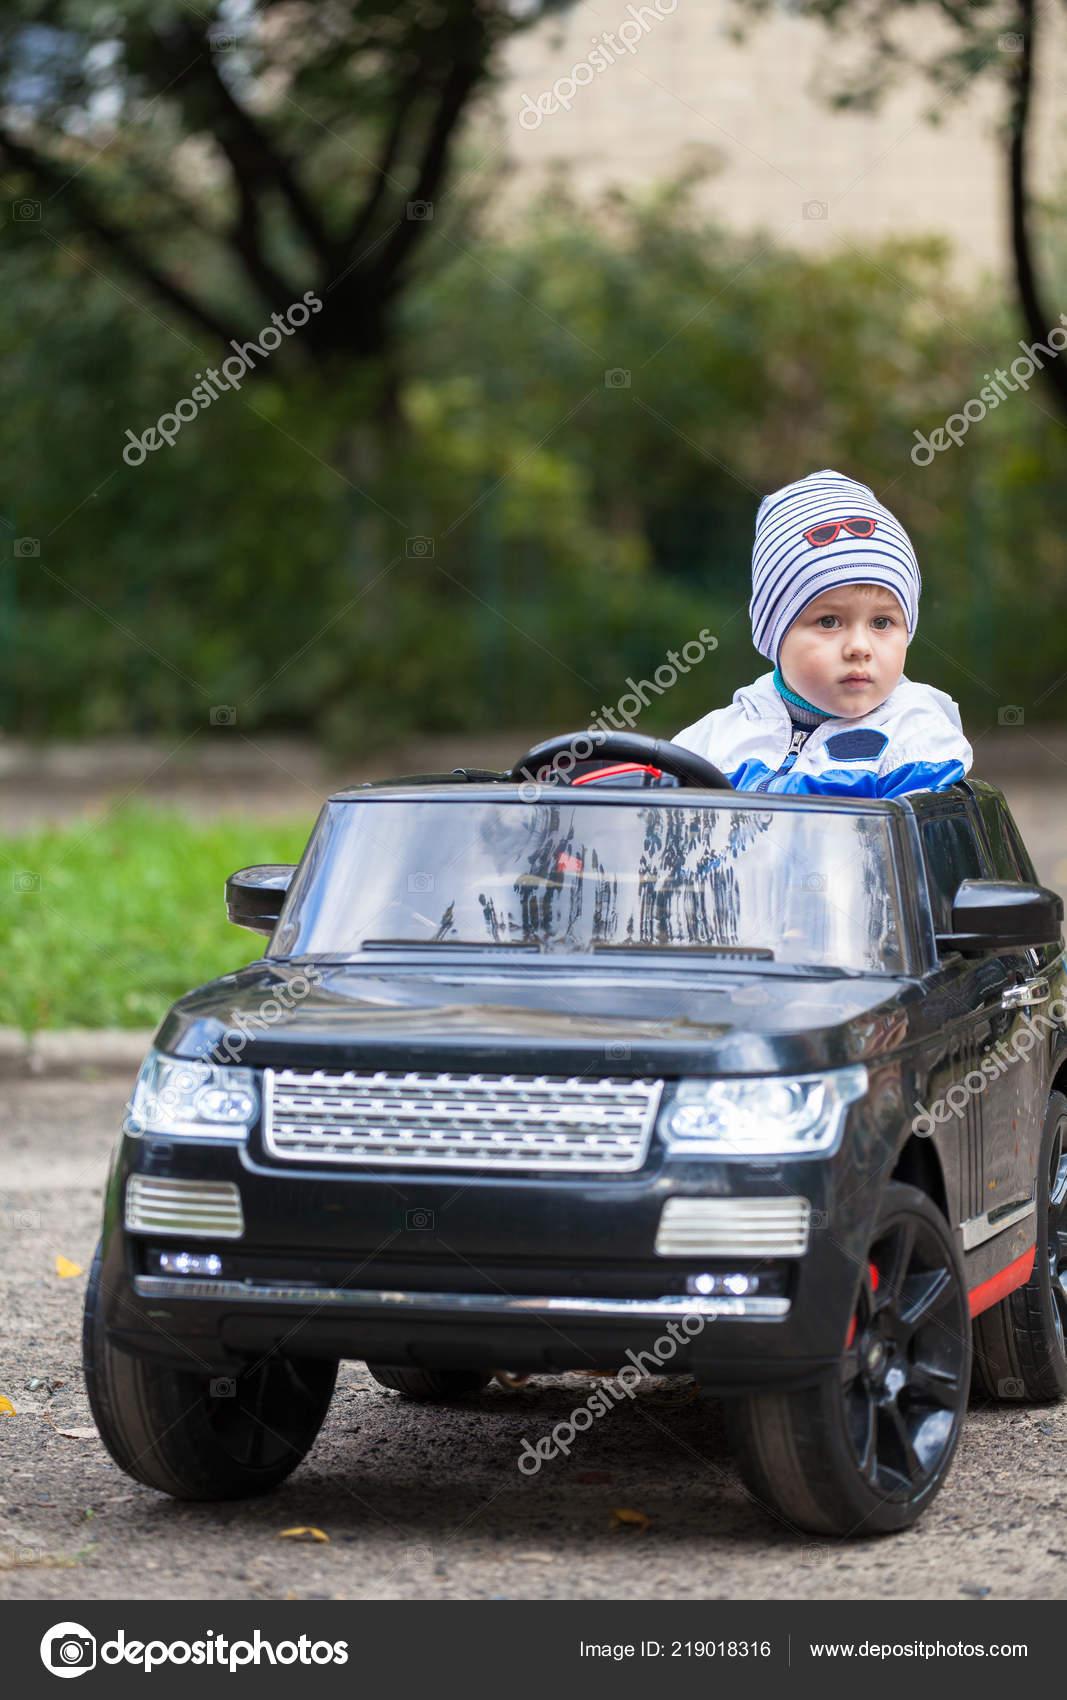 Cute Boy Riding Black Electric Car Park Funny Boy Rides Stock Photo C Vasyl Rohan 219018316